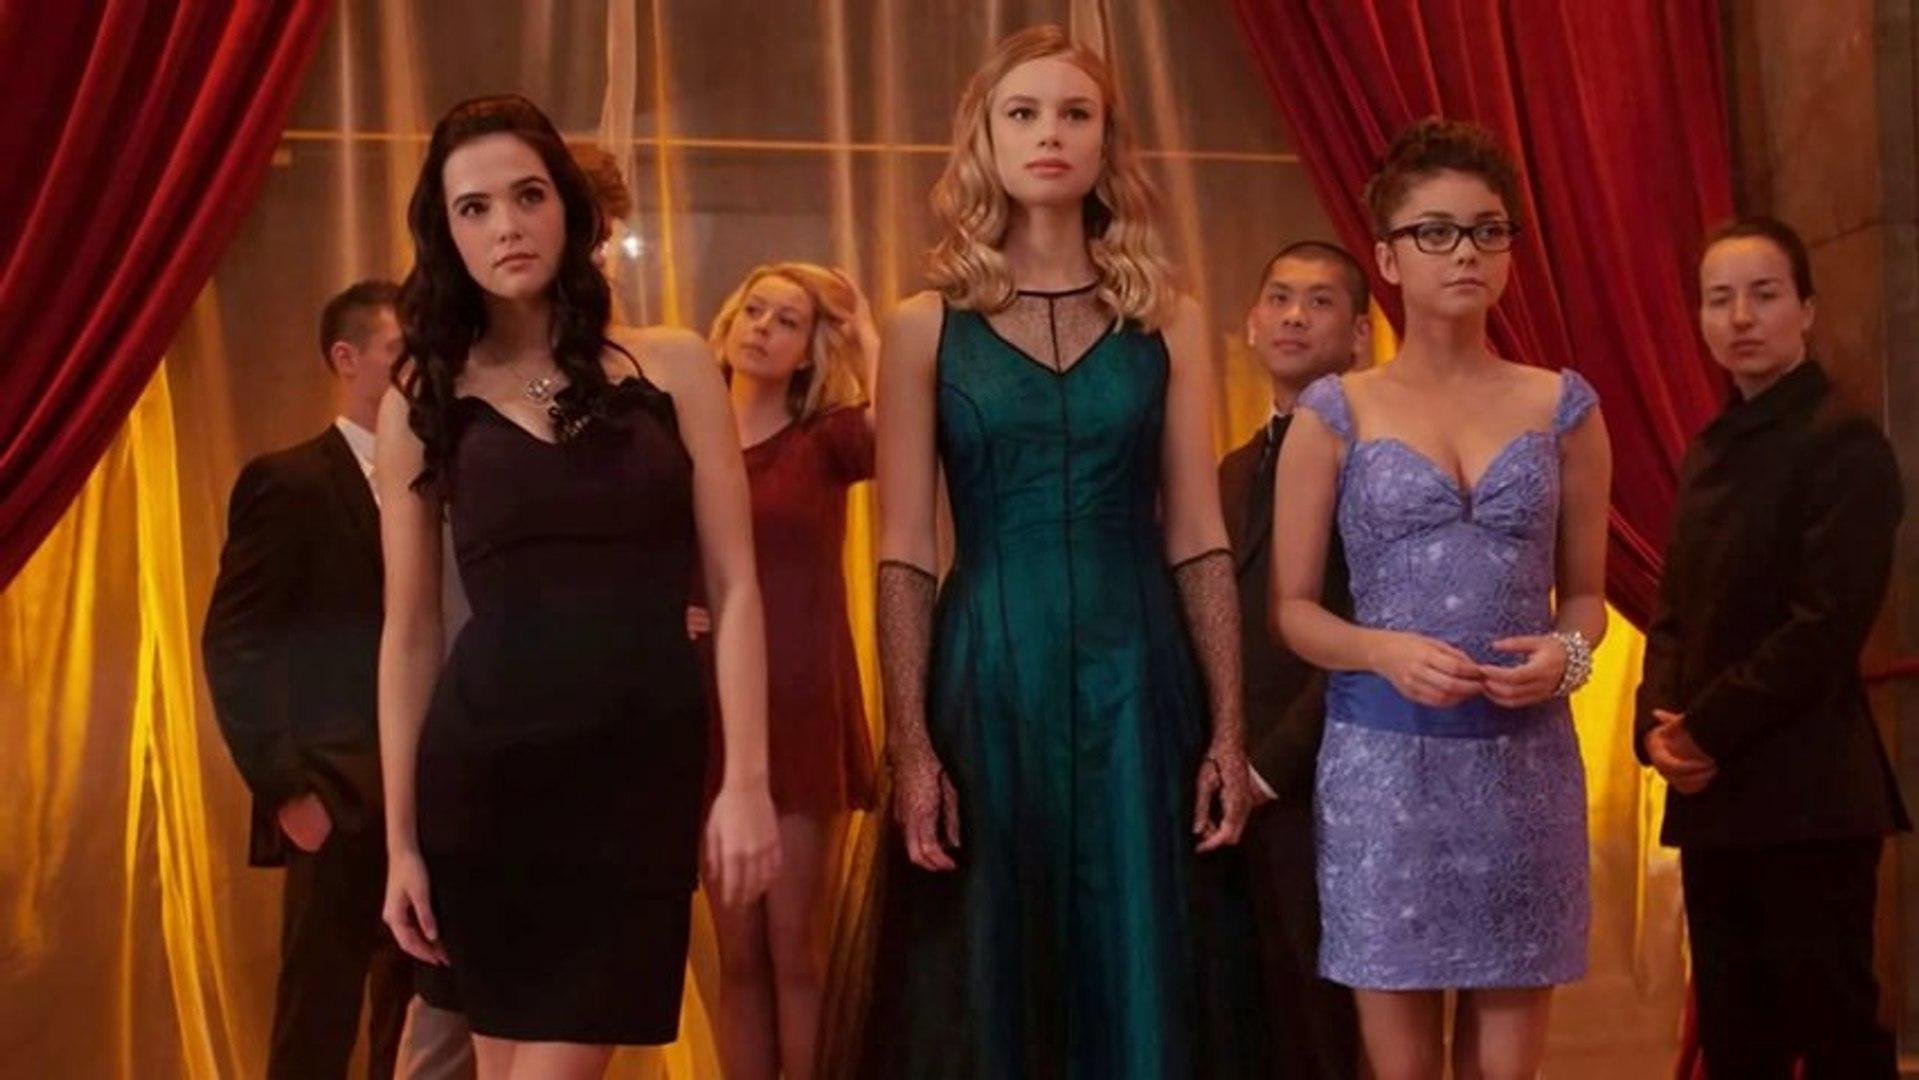 New VAMPIRE ACADEMY Trailer - AMC Movie News